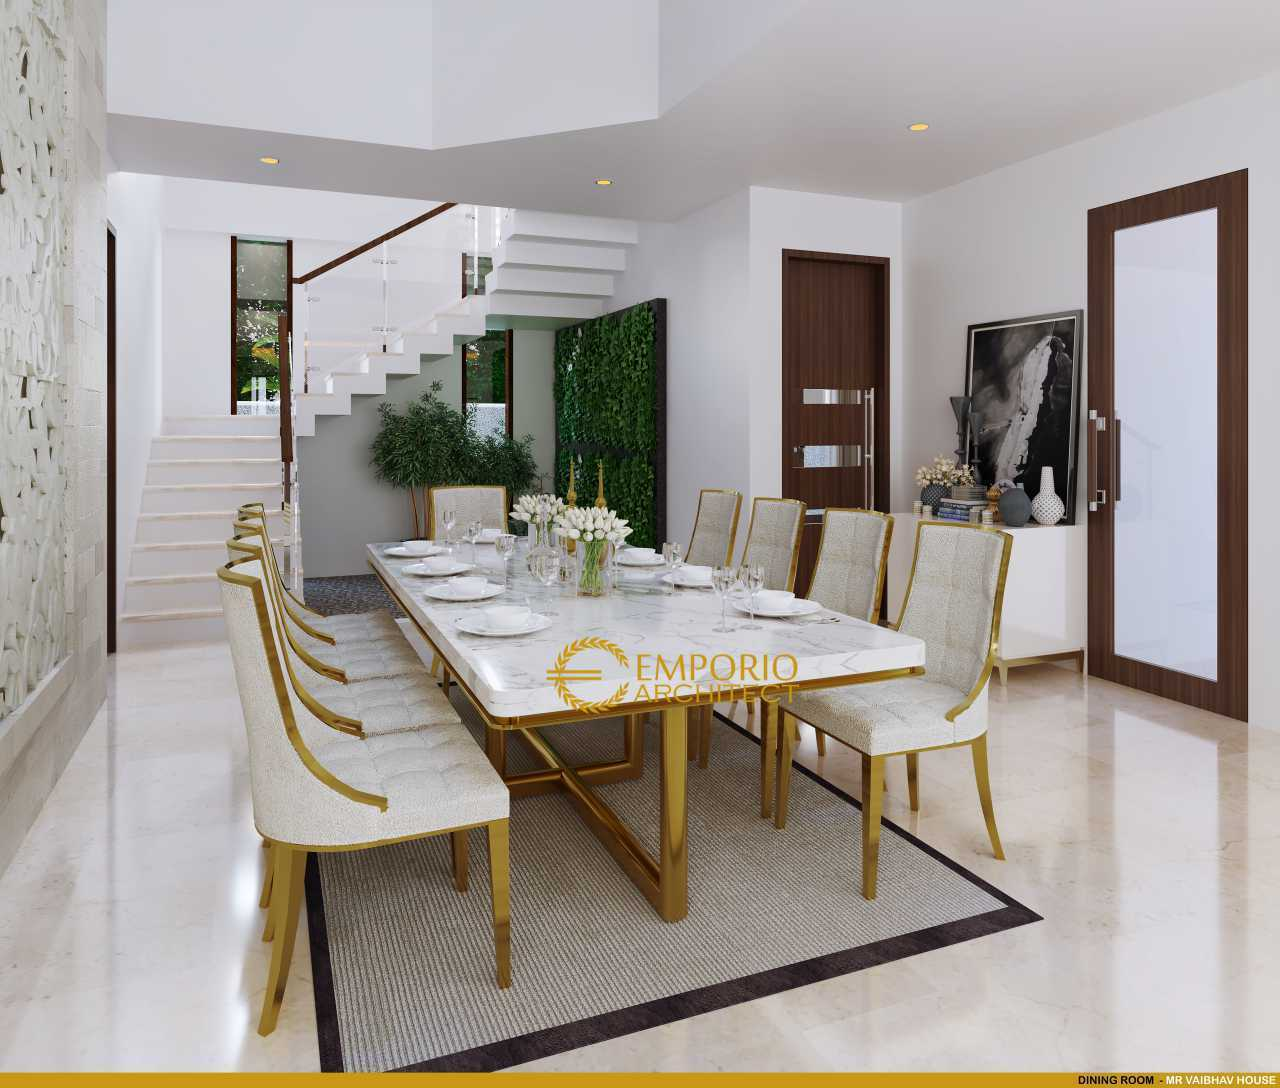 Emporio Architect Jasa Arsitek India Desain Rumah Villa Bali Tropis 724 @ India Rajpath, India Gate, New Delhi, Delhi 110001, India Rajpath, India Gate, New Delhi, Delhi 110001, India Emporio-Architect-Jasa-Arsitek-India-Desain-Rumah-Villa-Bali-Tropis-724-India  84756